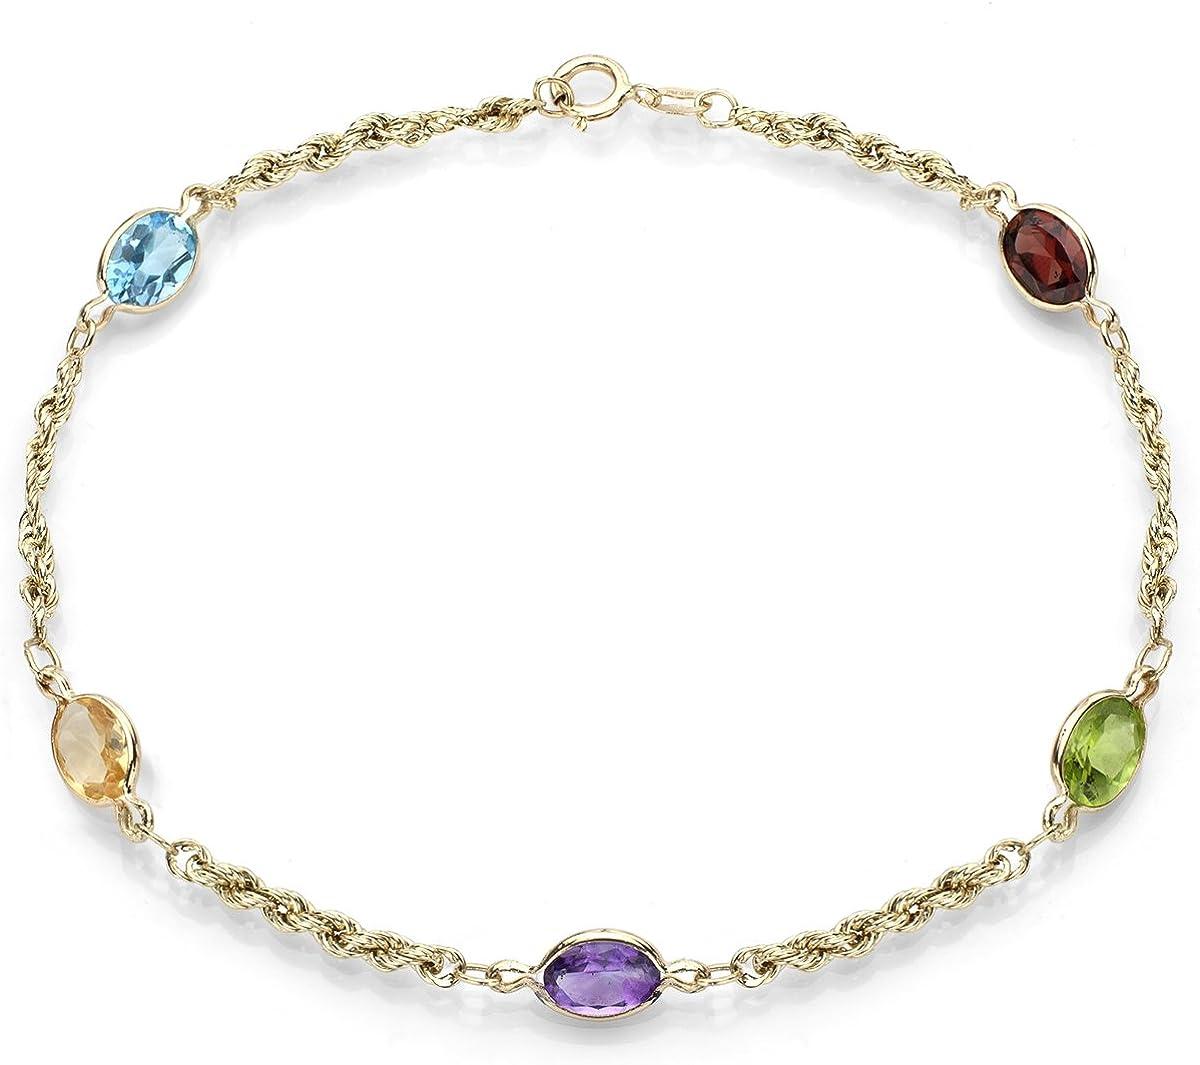 14K White Gold Multi-Colored Gemstone Bracelet 7.25 Inches